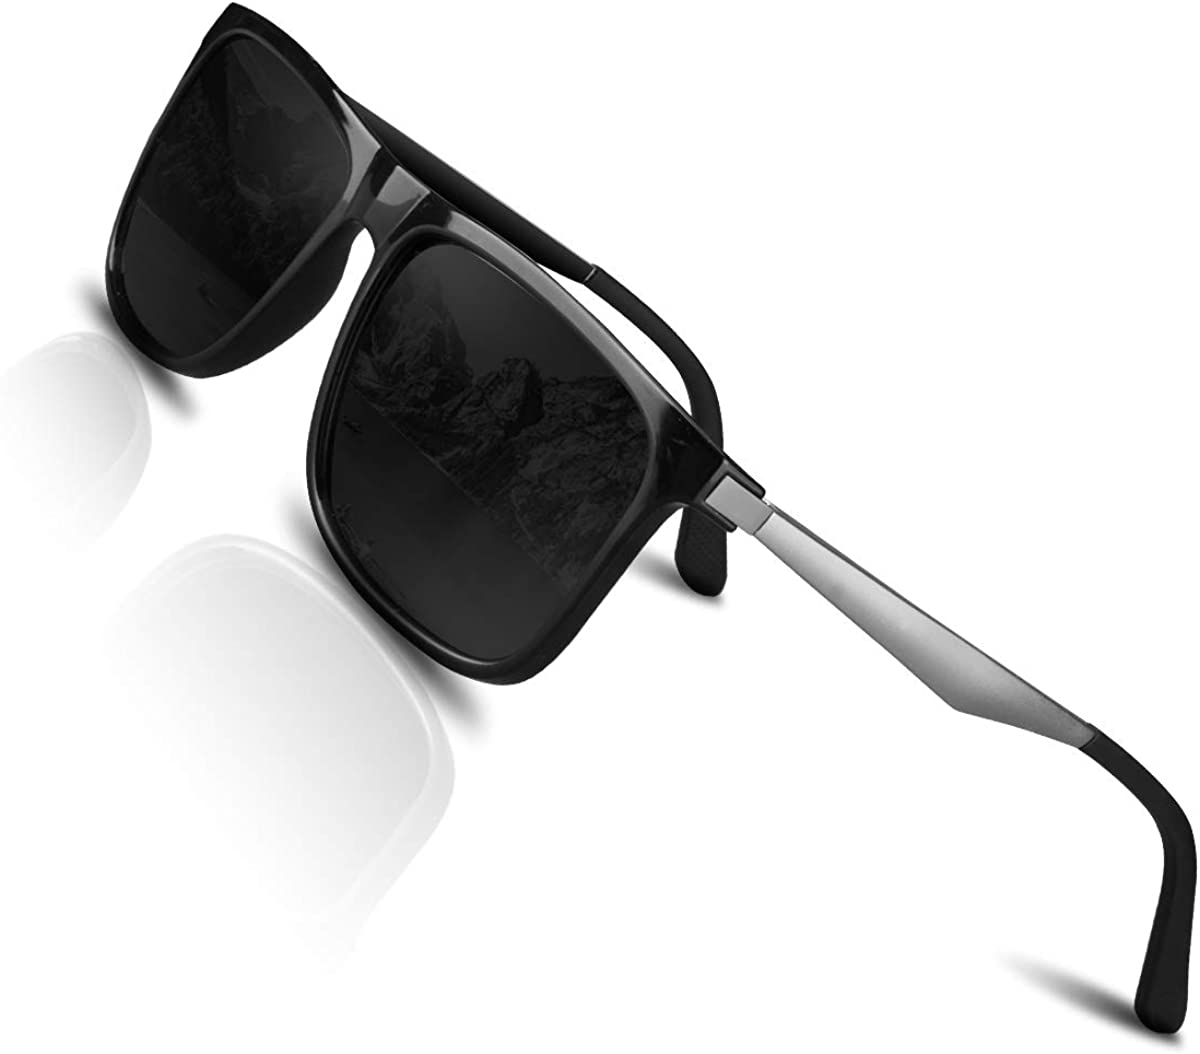 CHEREEKI Gafas de sol Hombre Mujer Polarizadas UV400 Protection Clásico Retro Gafas